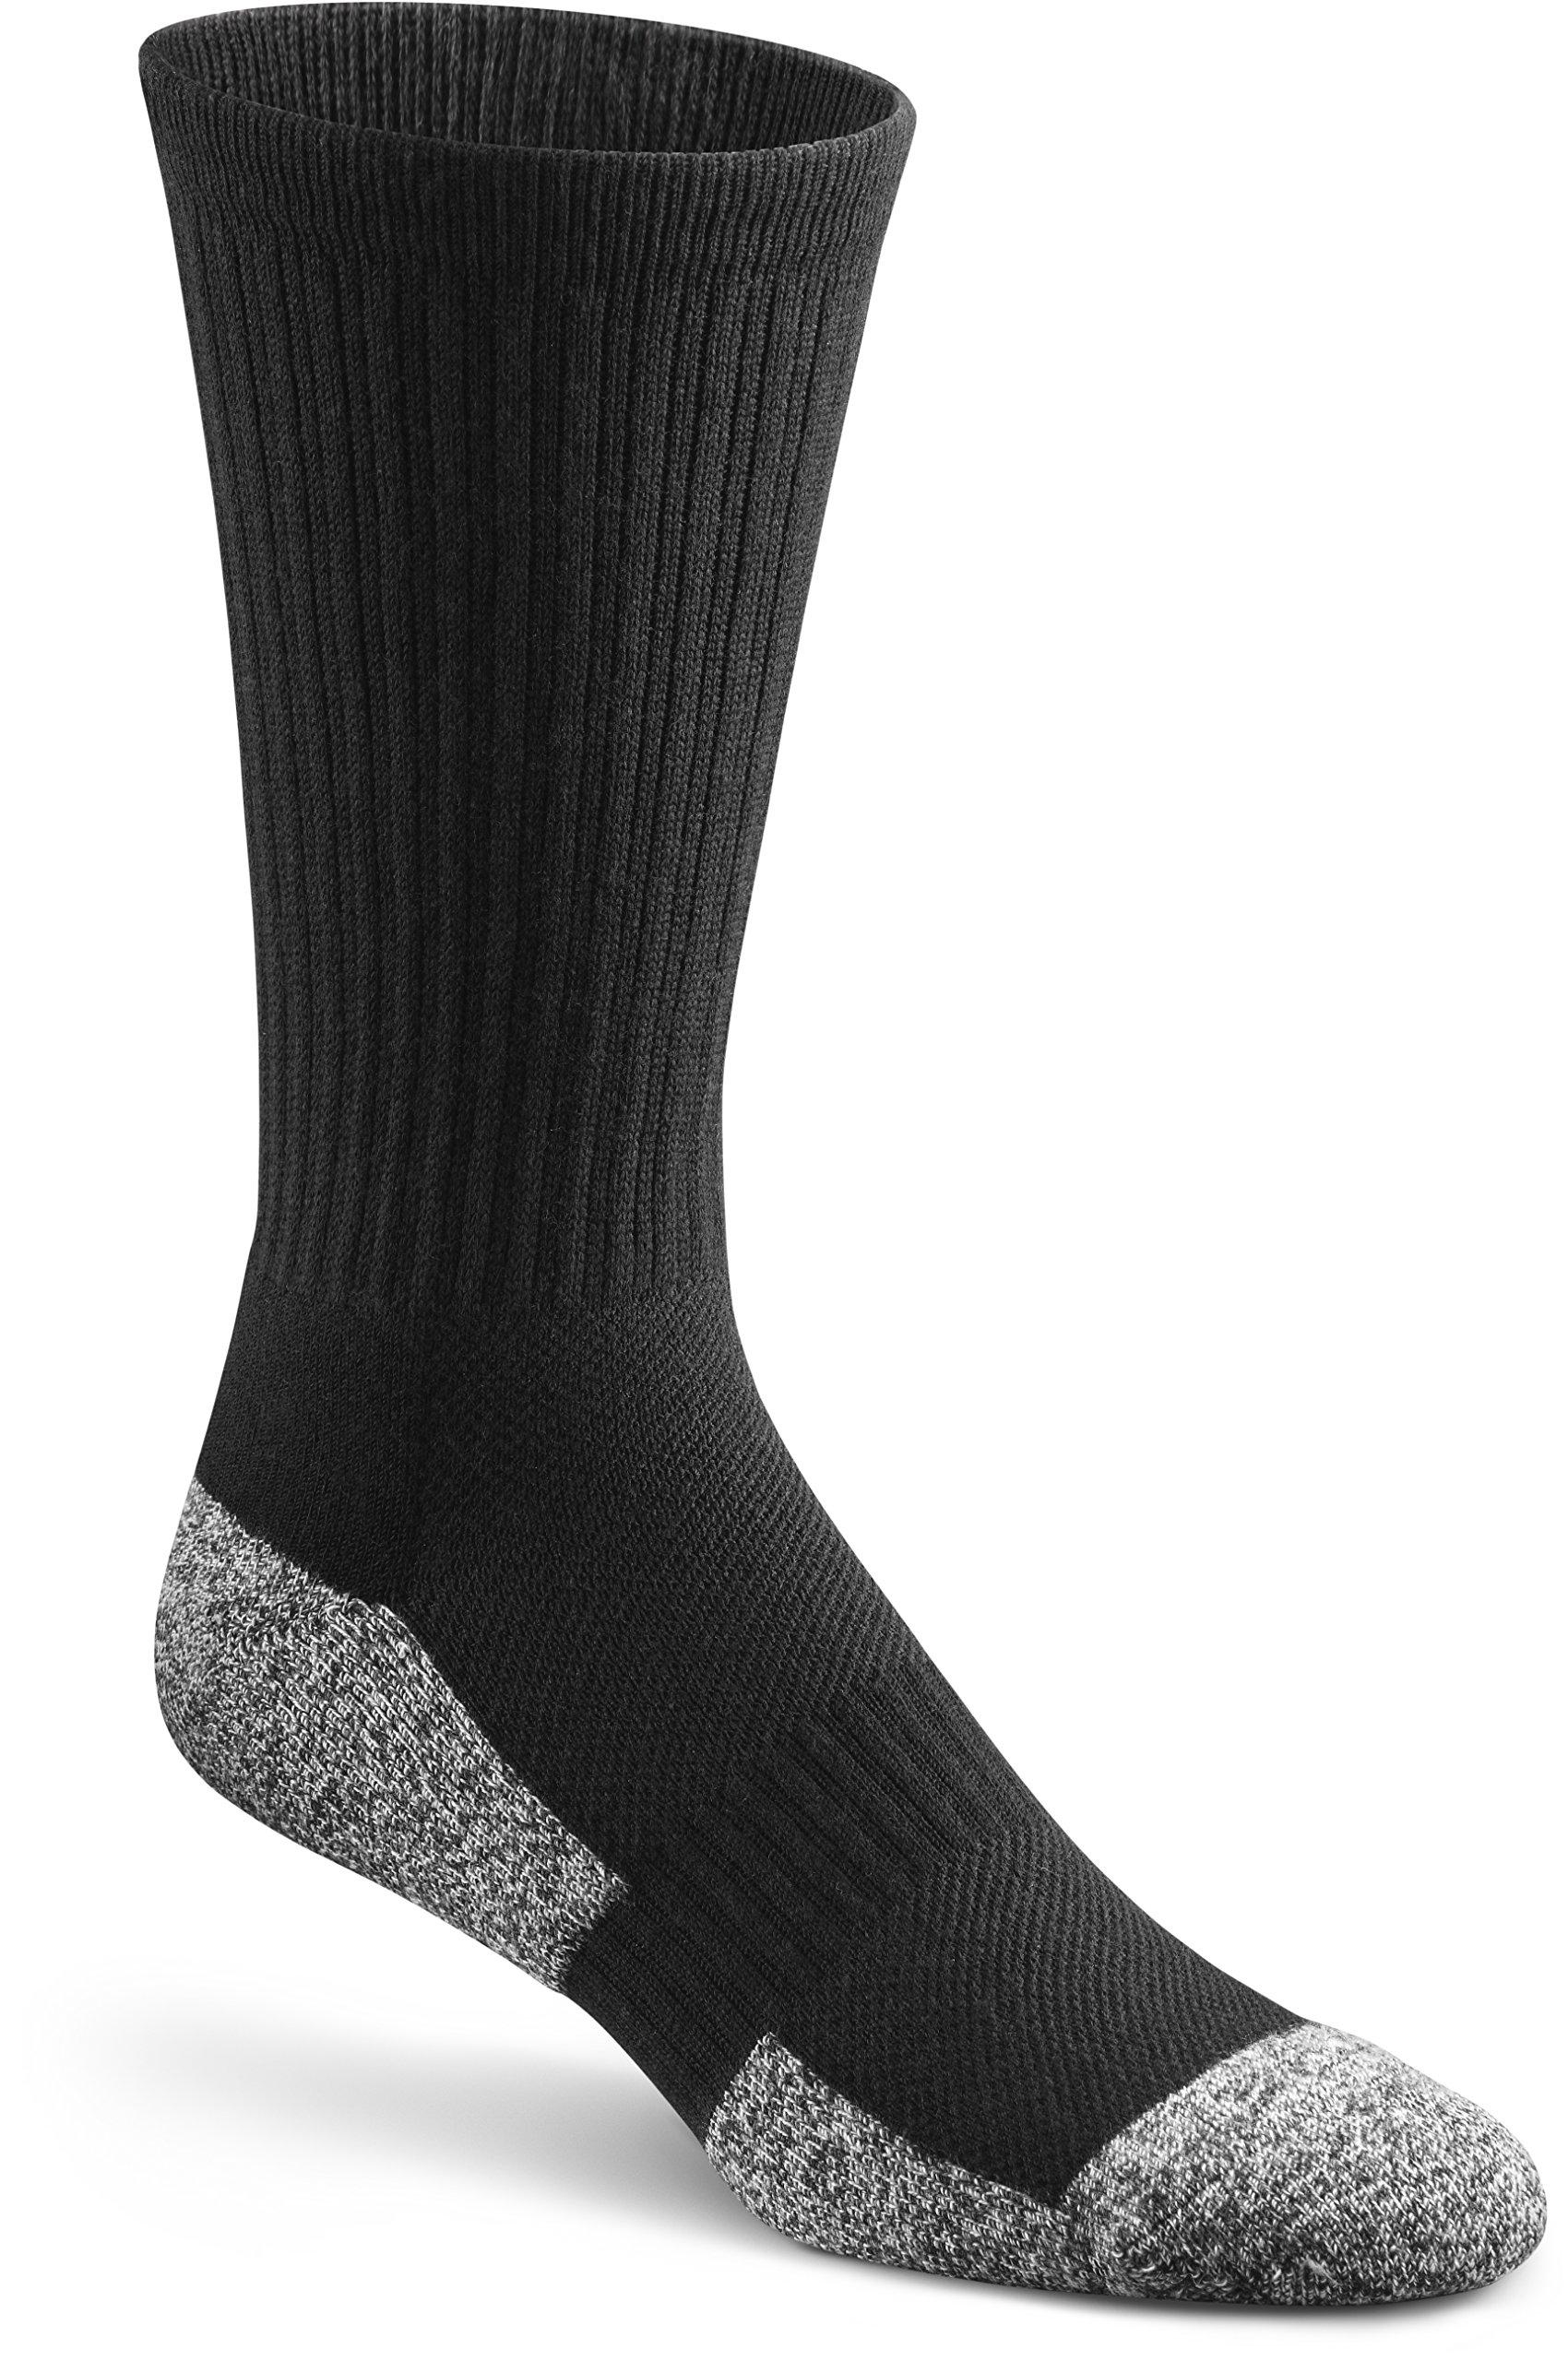 comforter view keen women slip pdp grain pld doctor w footwear s p full shoes kaci comfort in magnet on small